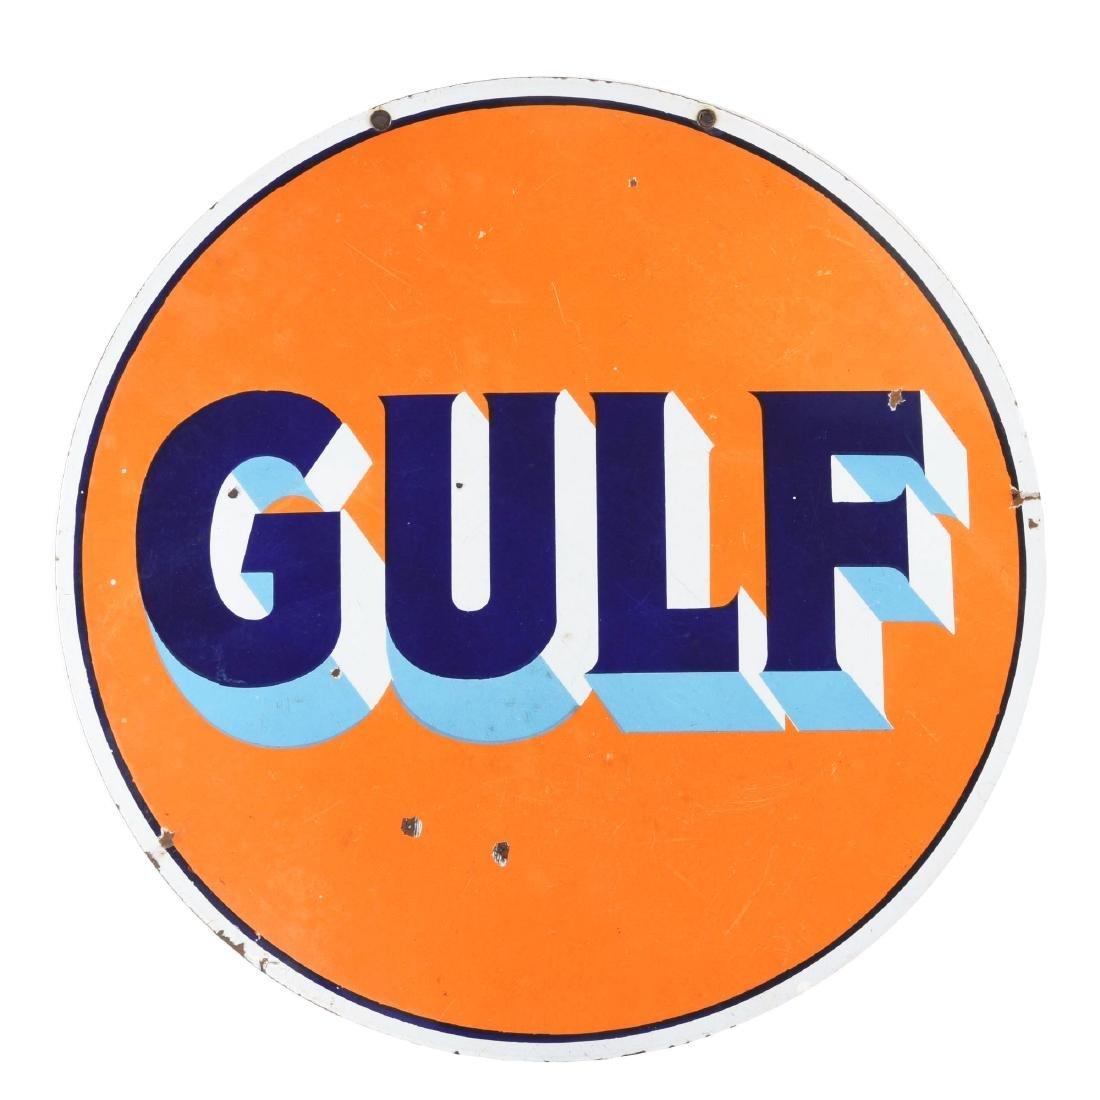 Gulf Gasoline Porcelain Curb Sign.